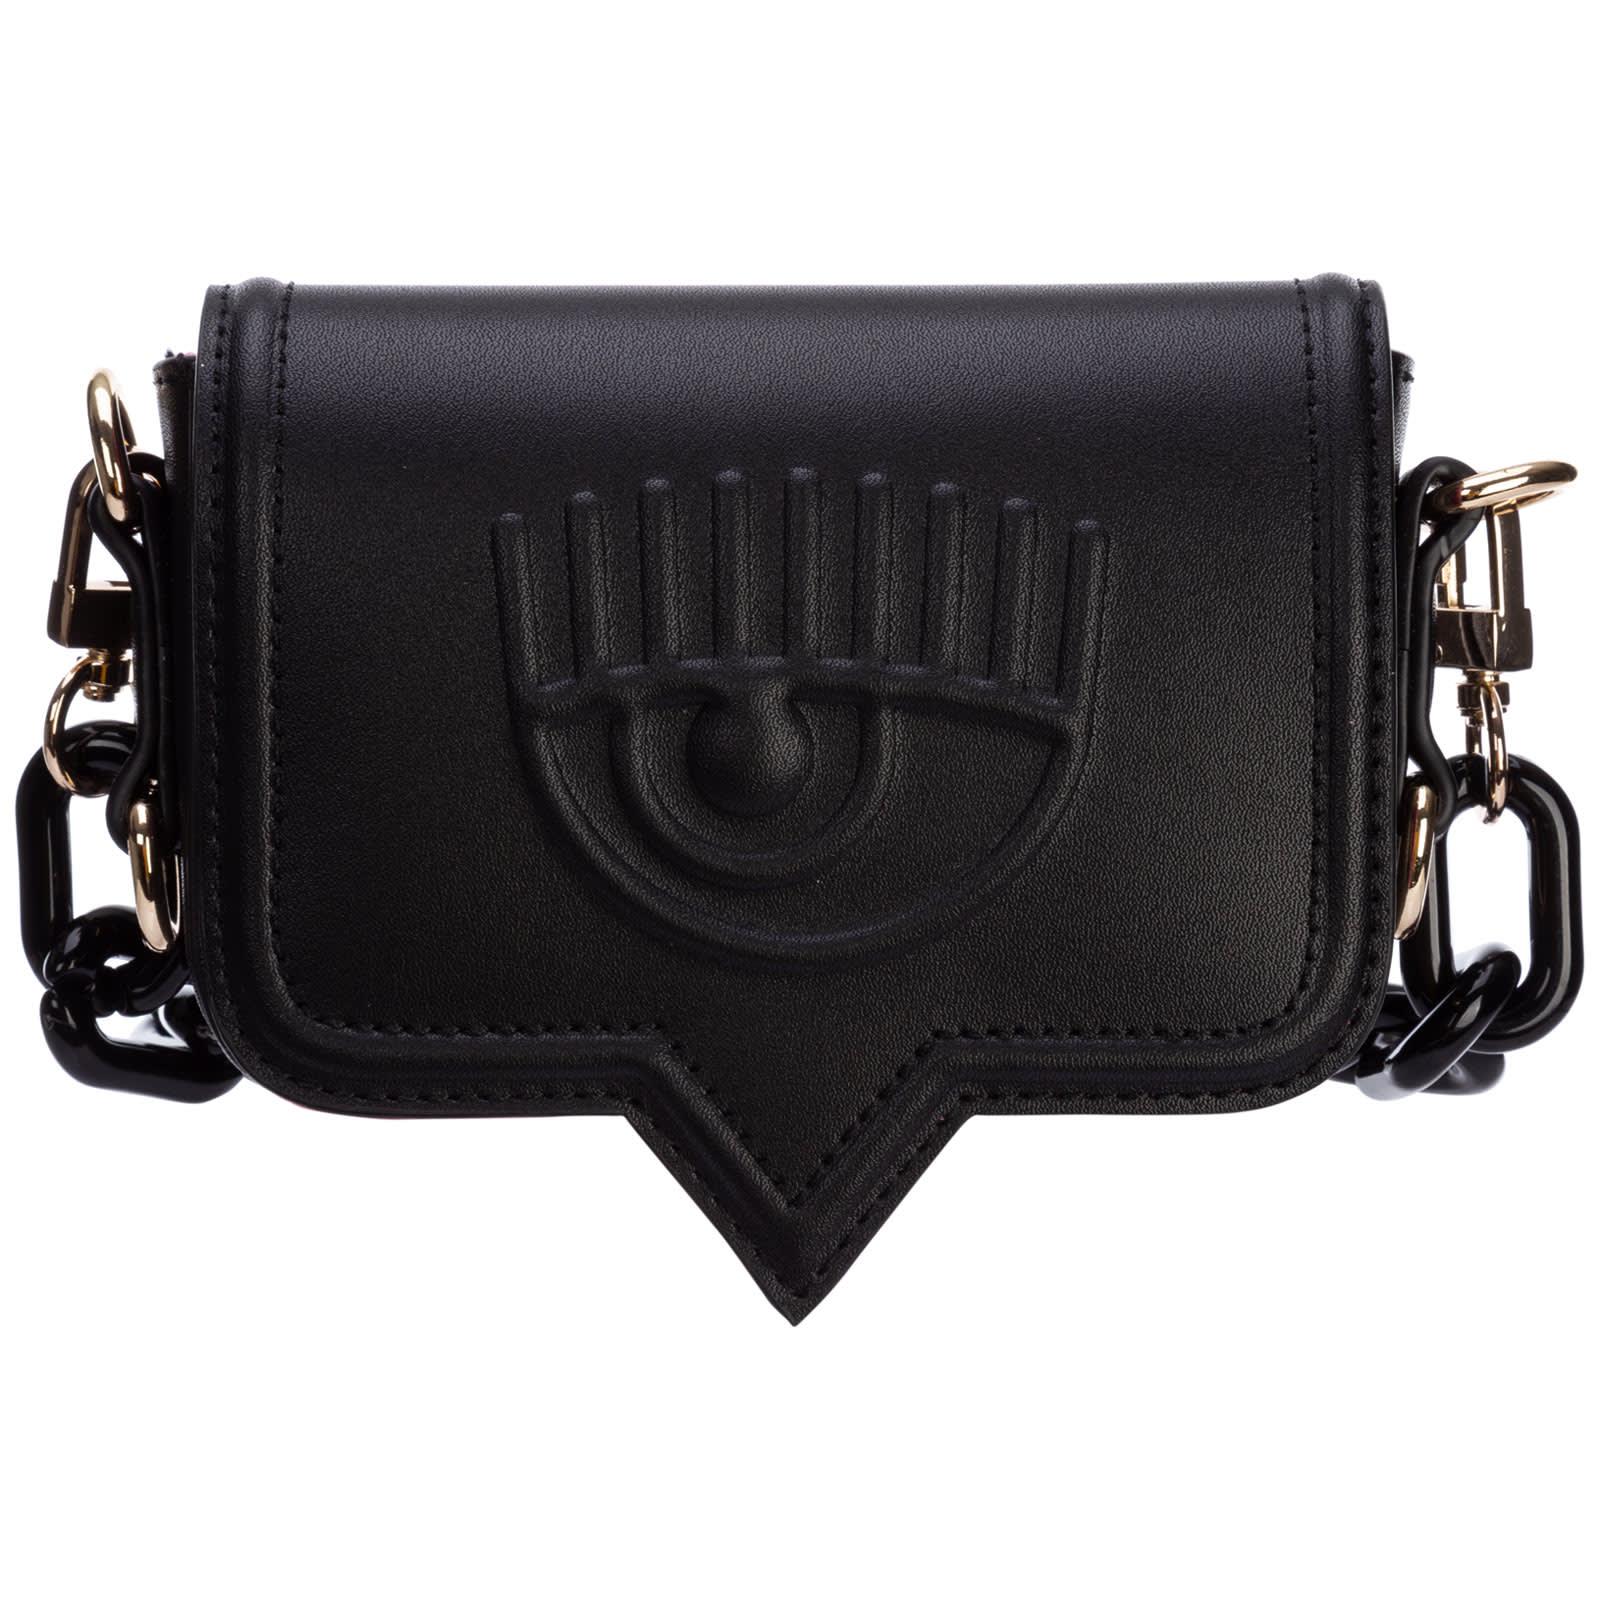 Chiara Ferragni Eyelike Crossbody Bags In Black